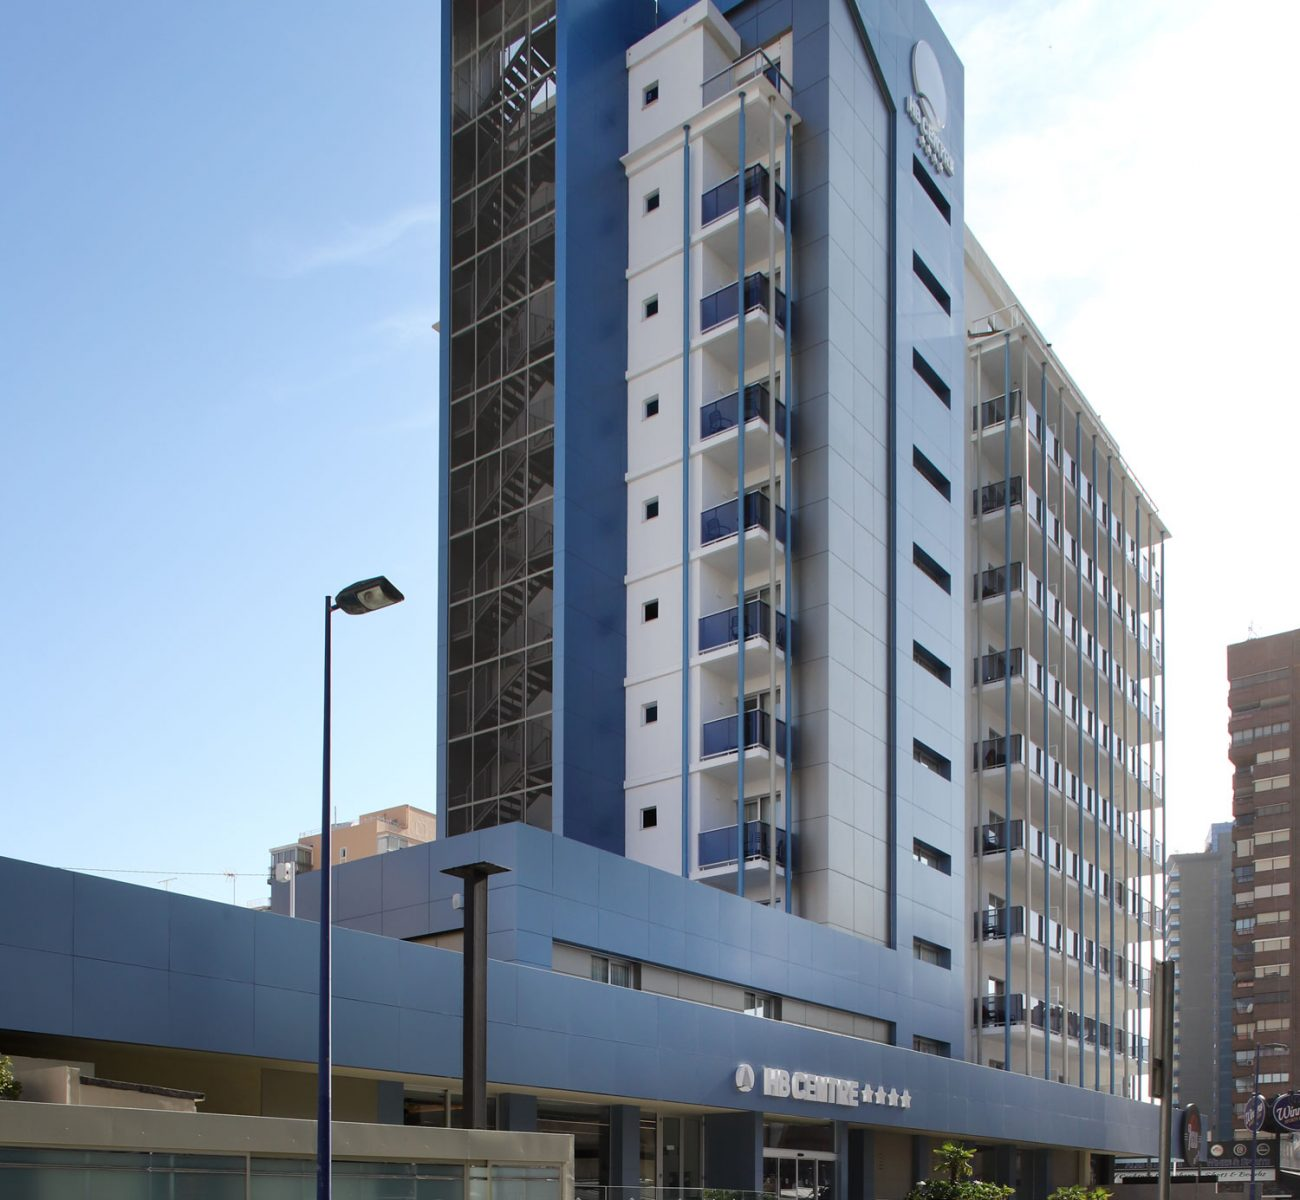 Hotel Benidorm Centre2